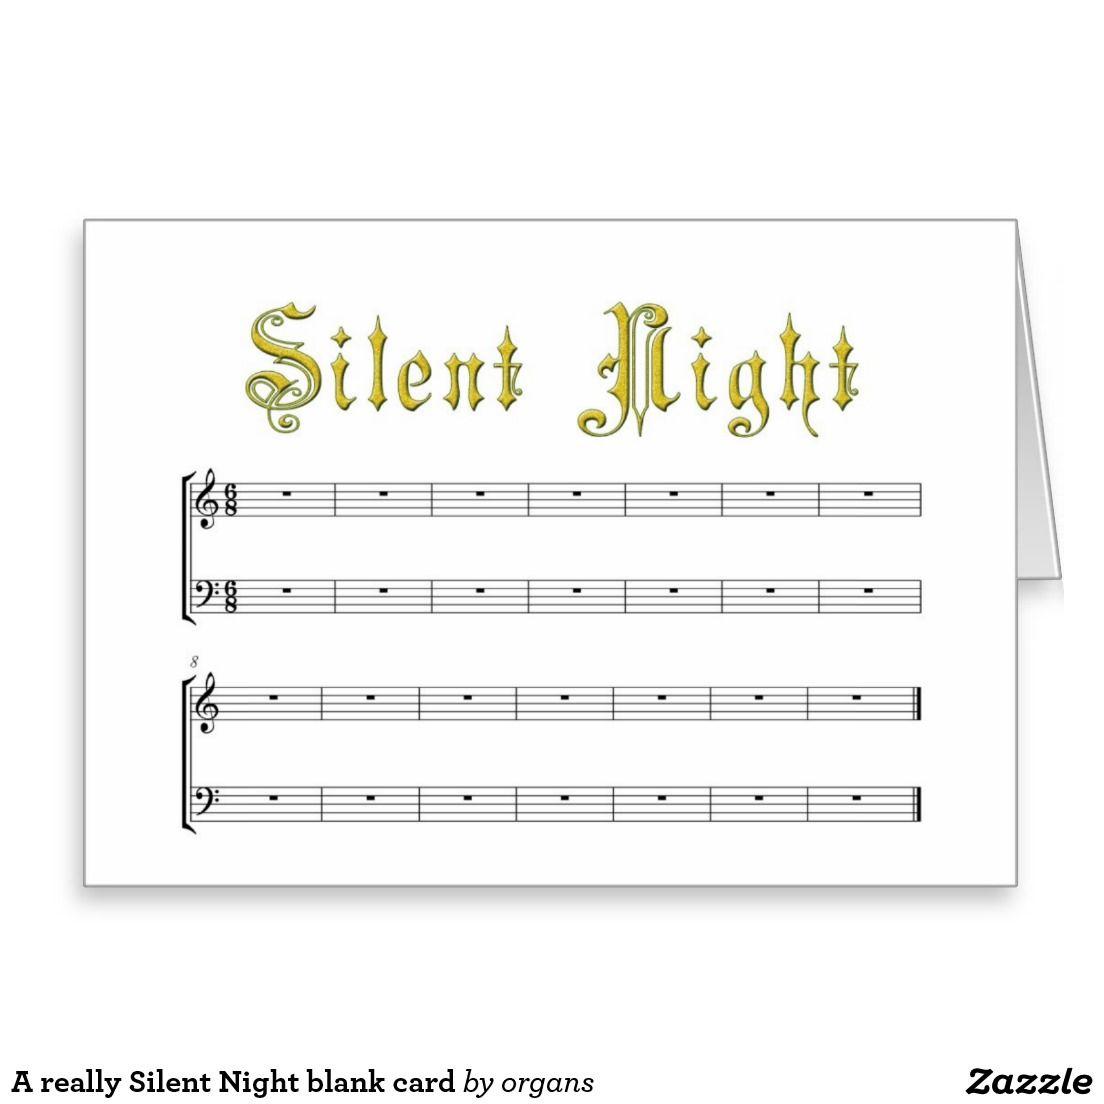 A really Silent Night blank card